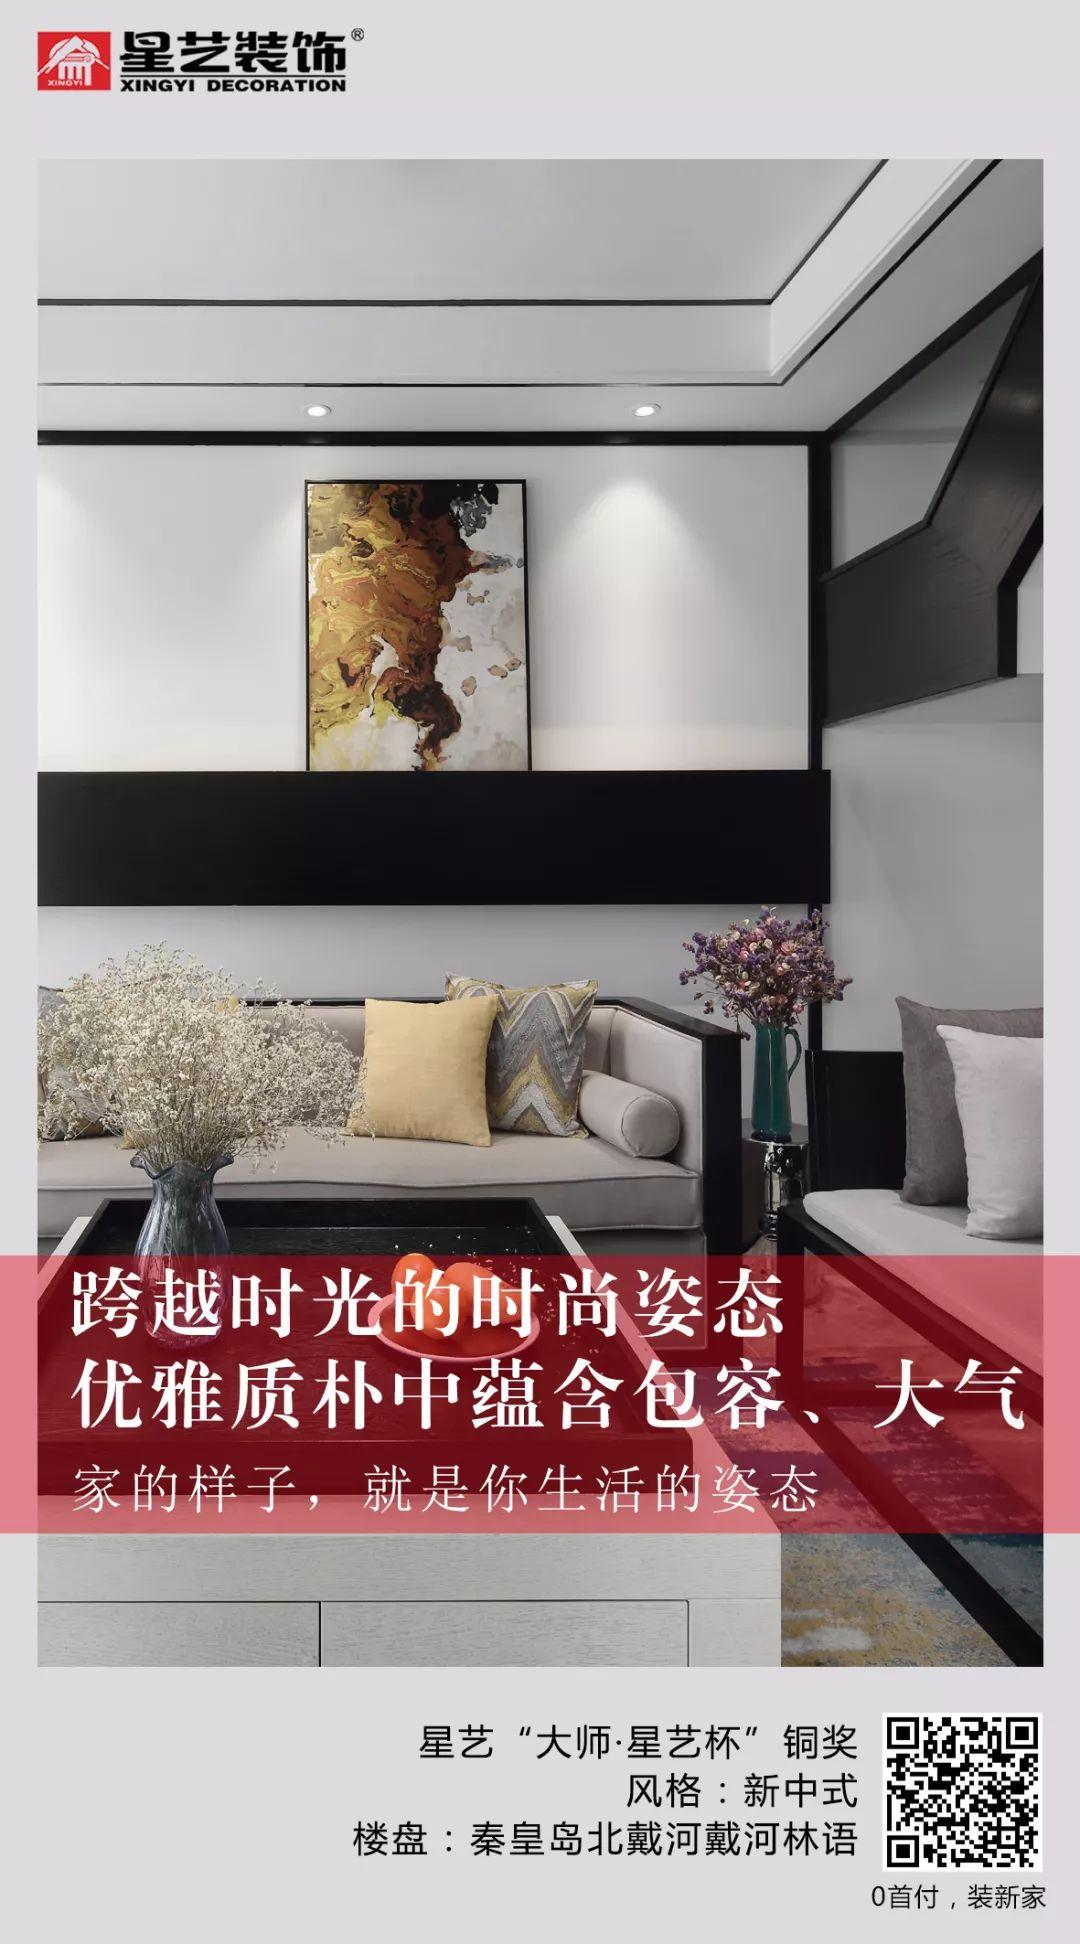 //xystcdn.xydec.com.cn/uploadfiles/image/20190327/1e950eb753f6dcf759a3b3368037b7a4.jpg